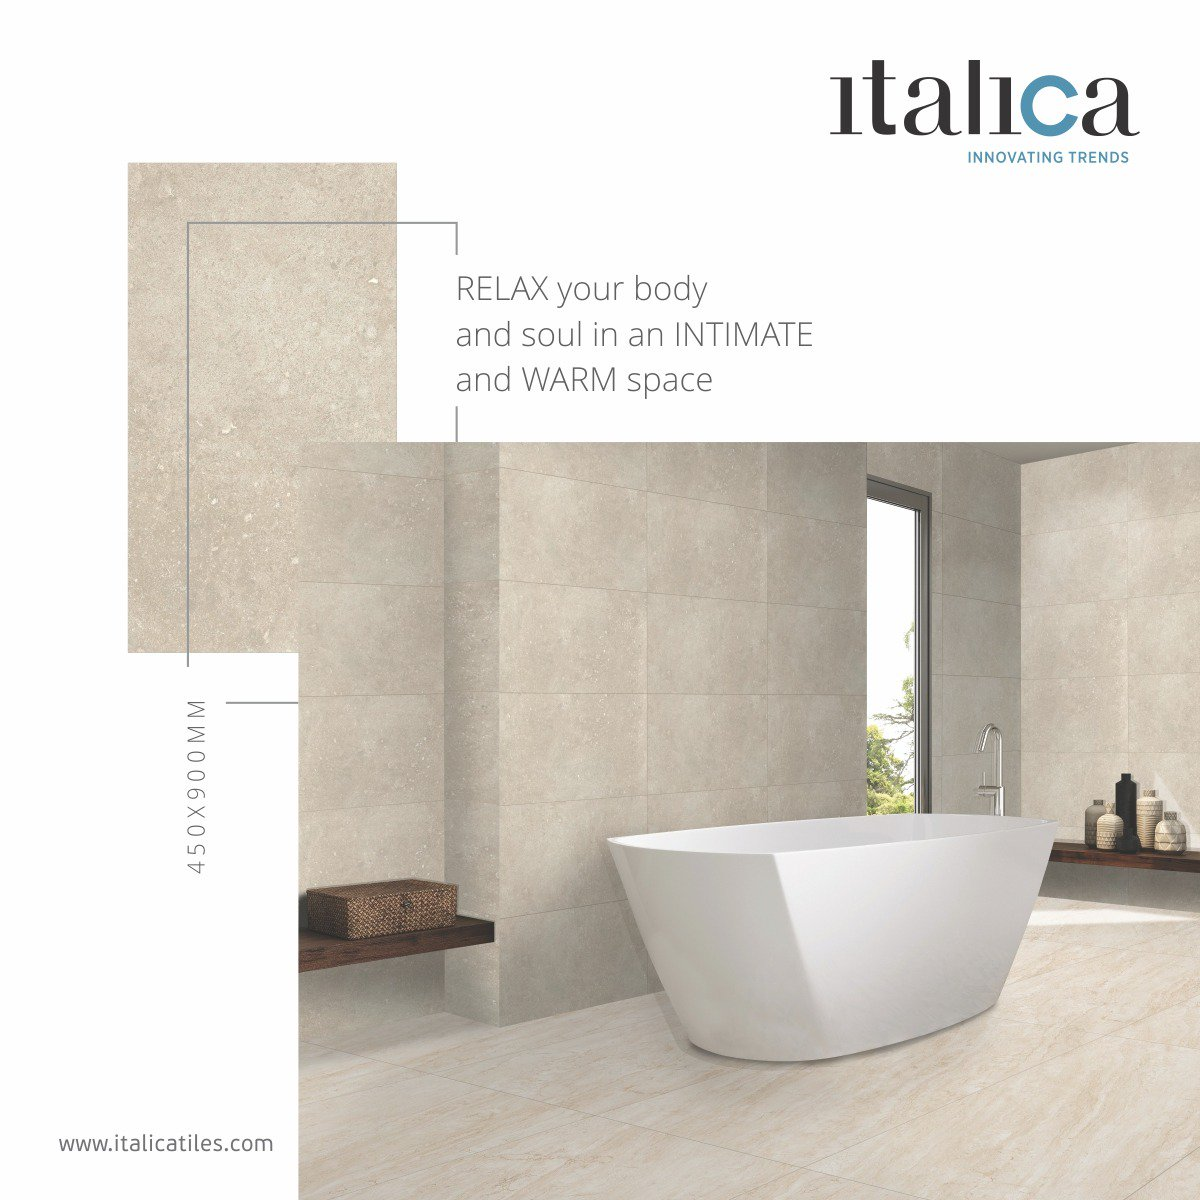 Italica Floor Tiles on Twitter: \